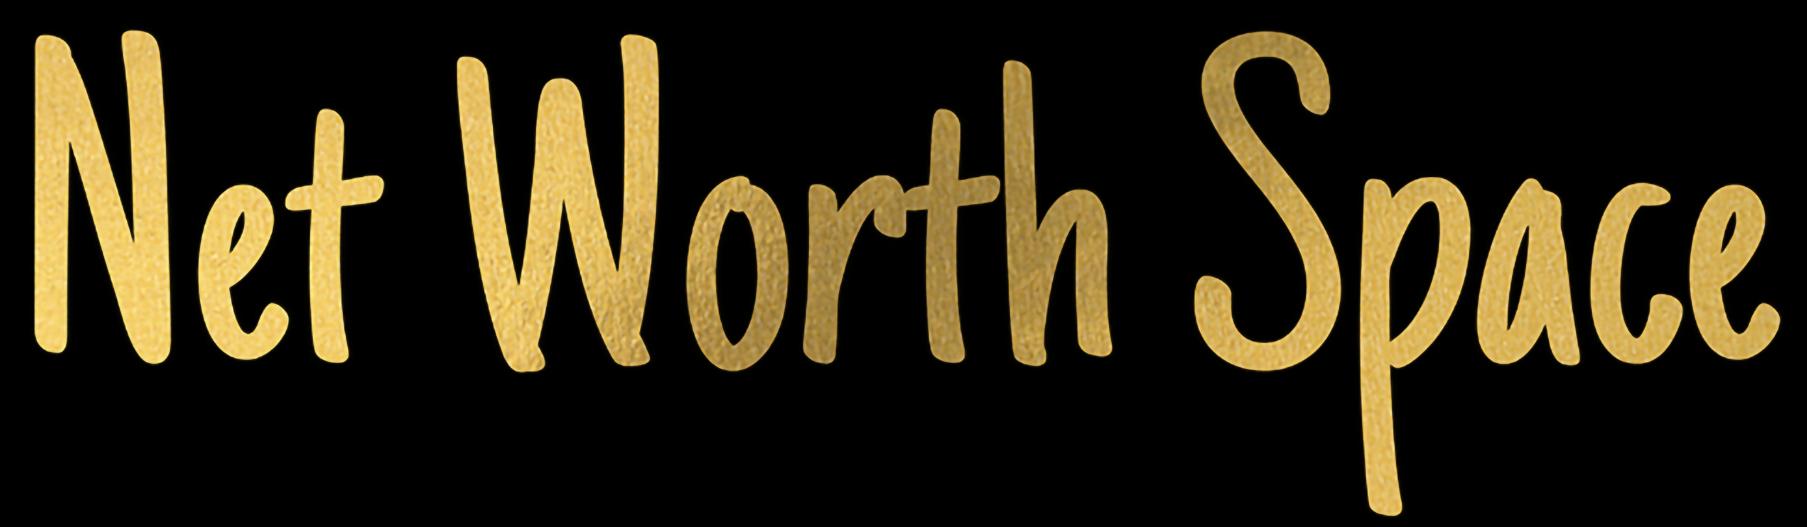 Net Worth Space